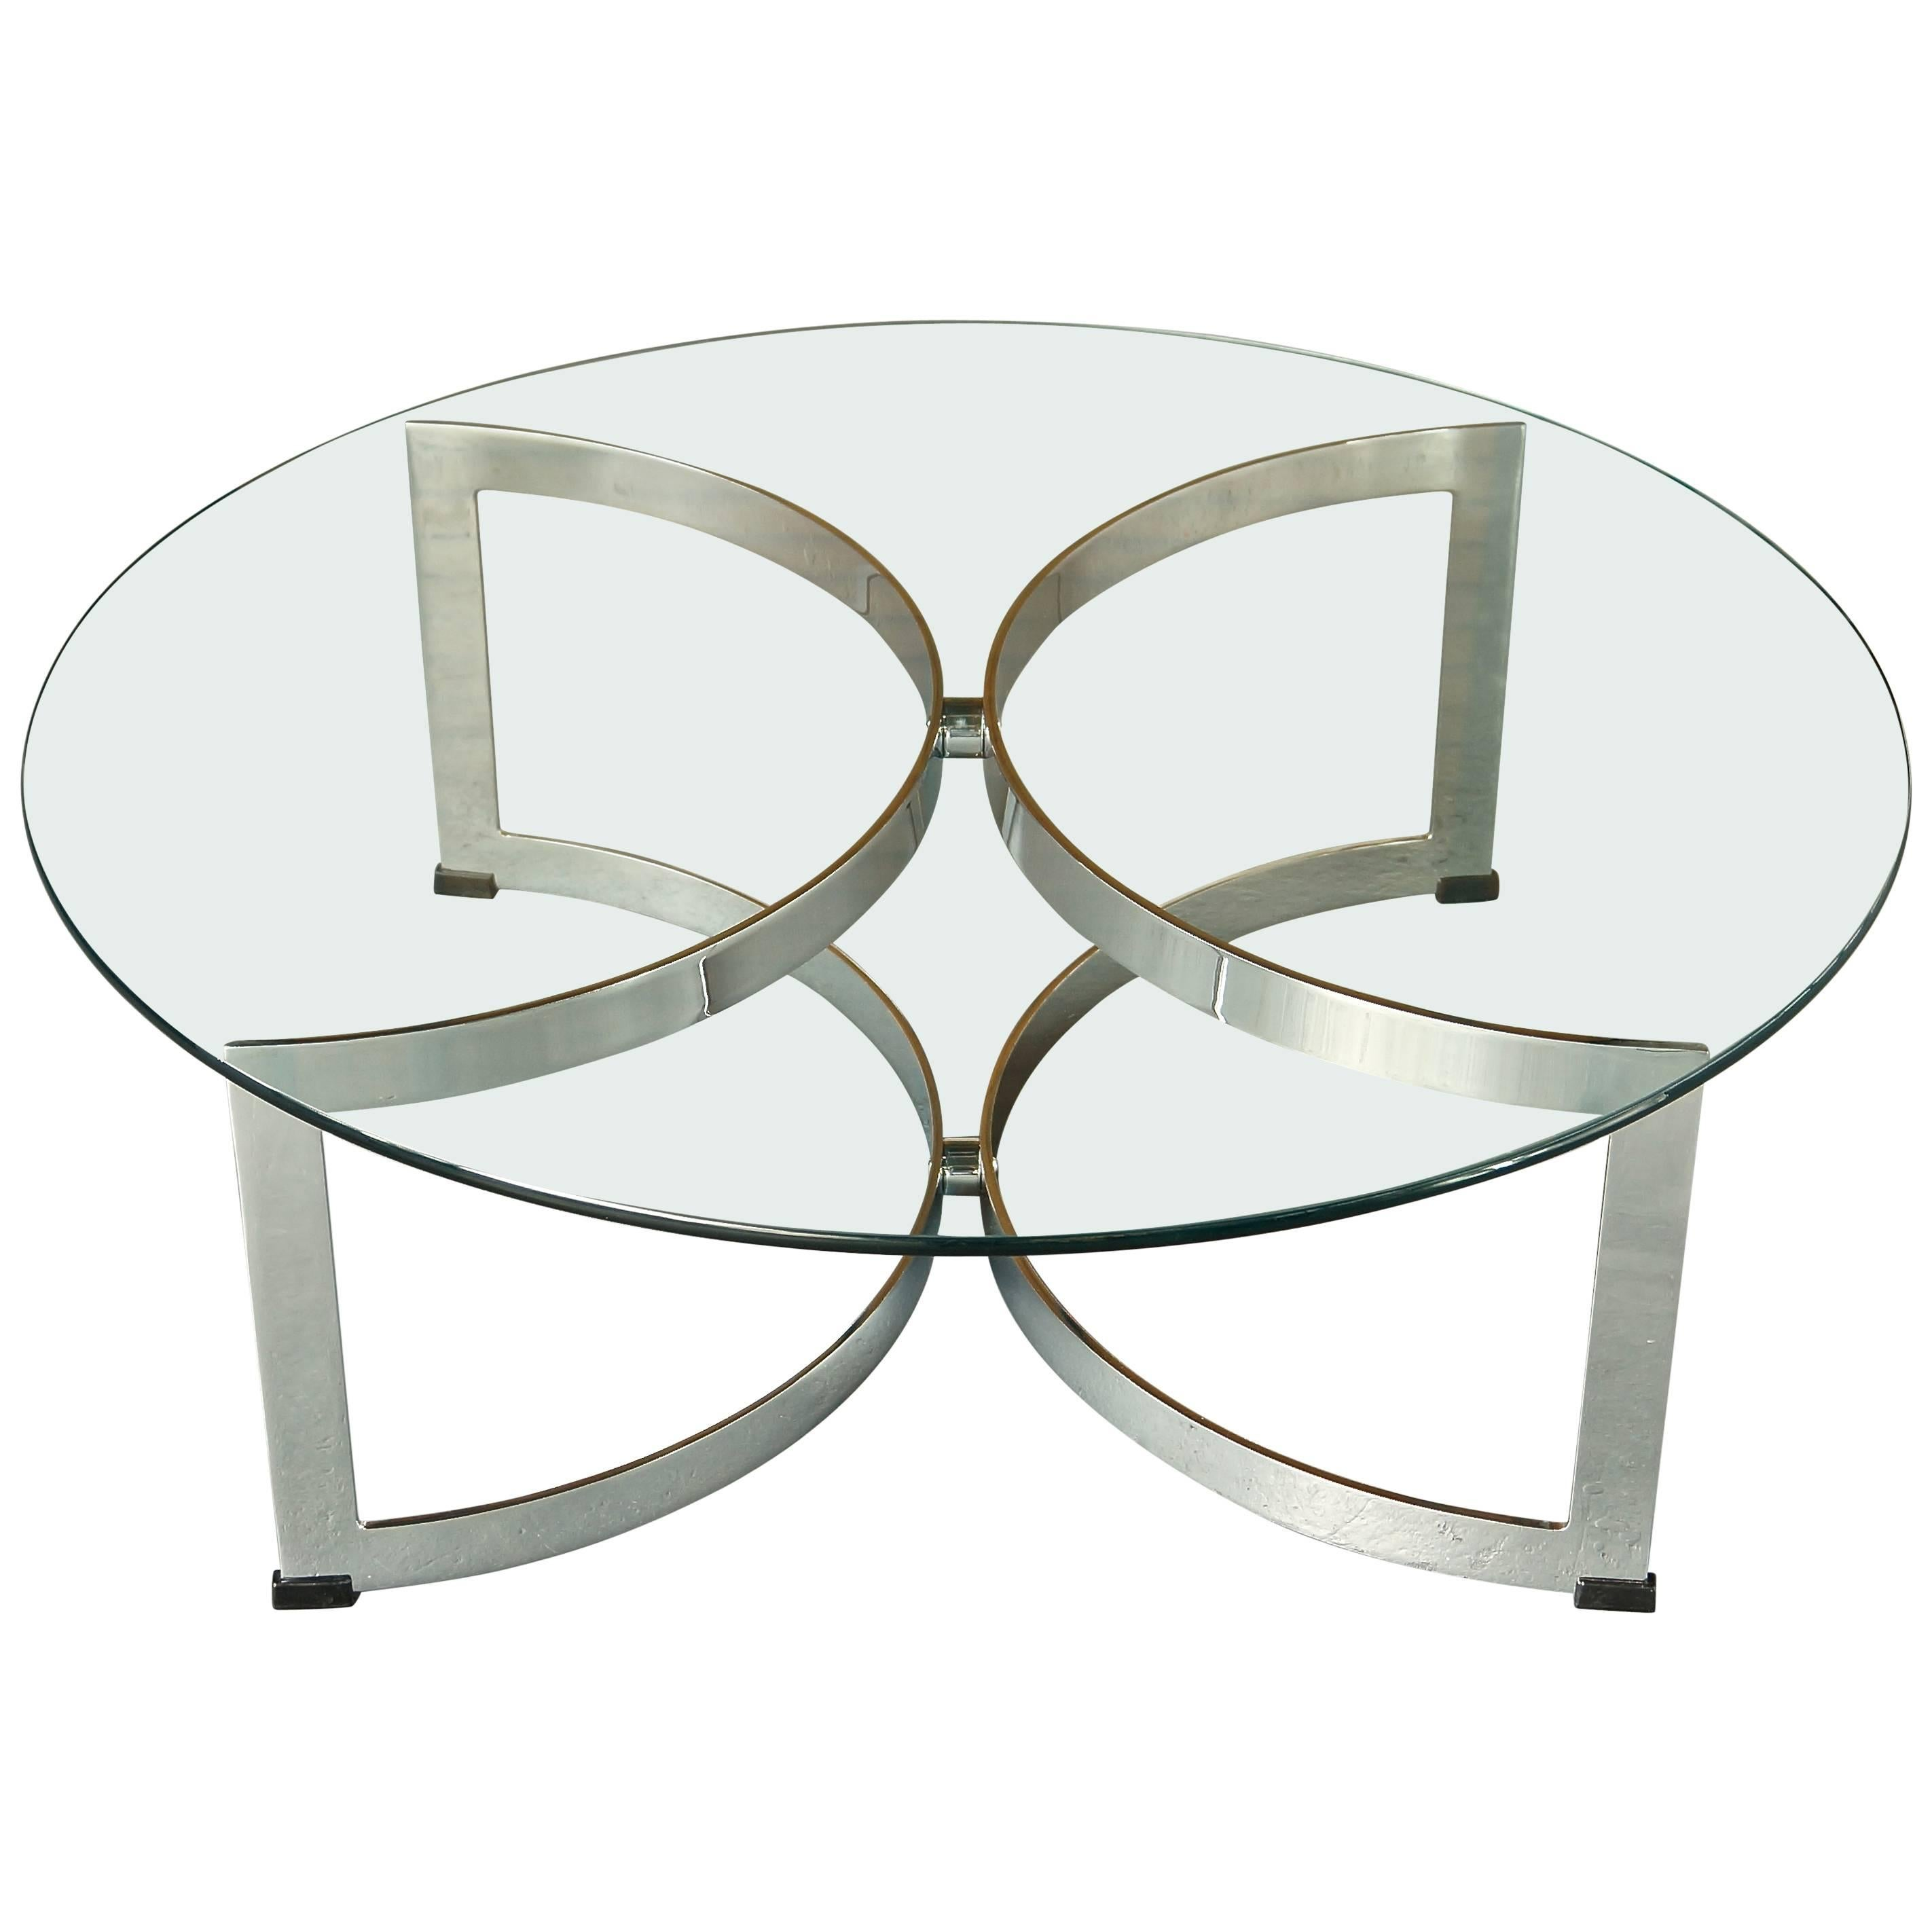 Vintage Model 341C Chrome Steel Glass Circular Coffee Table, Merrow  Associates For Sale